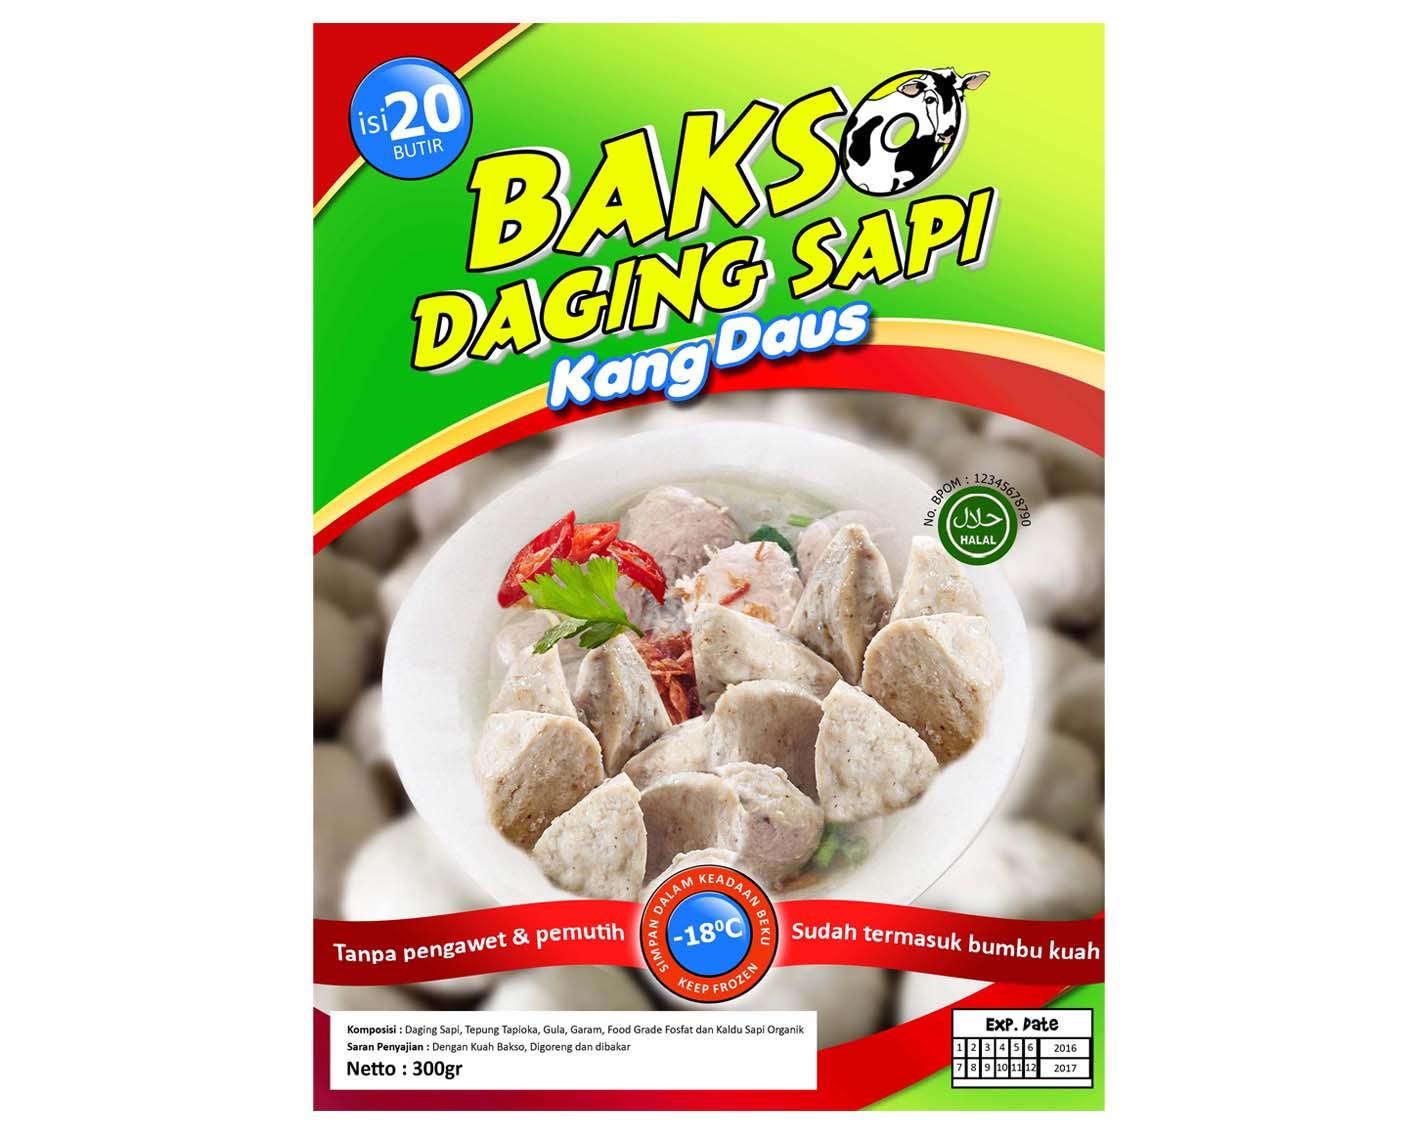 Sribu desain label desain label bakso daging sapi kang c91520bce4 thecheapjerseys Image collections